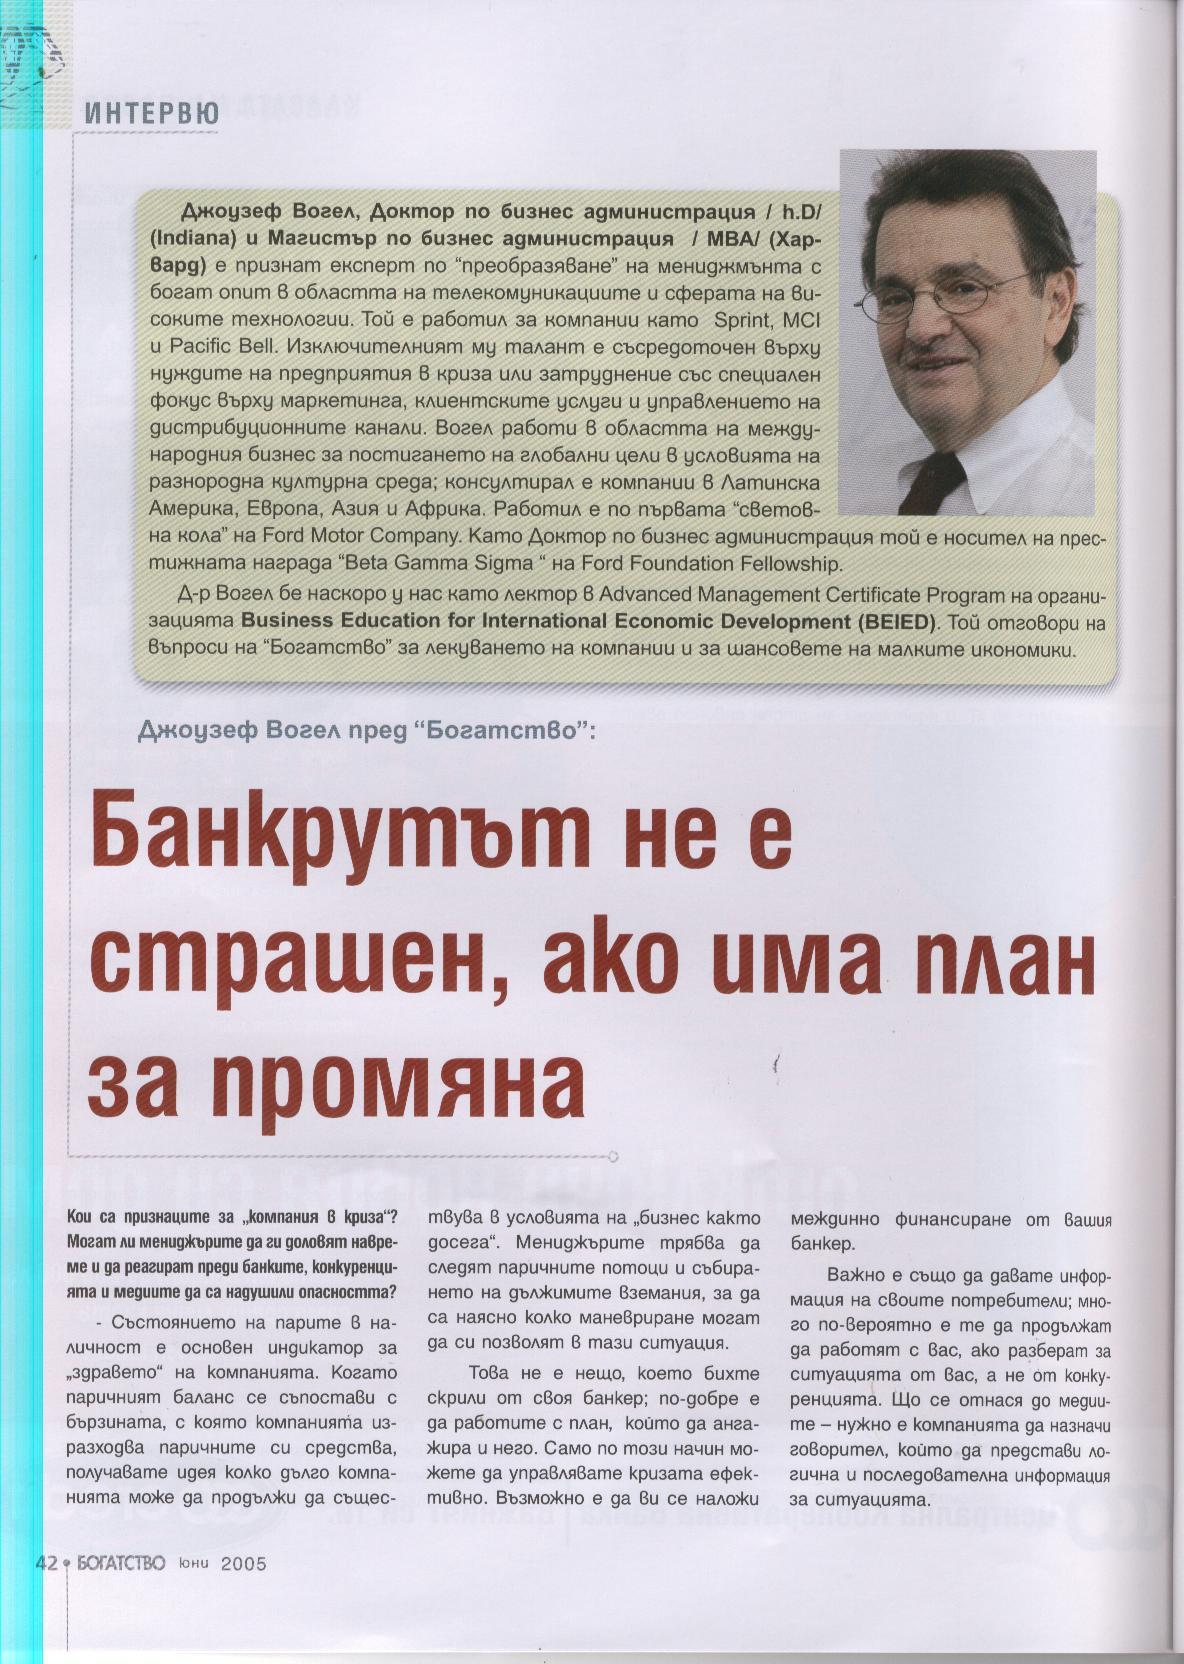 Joseph Vogel in Bogatstvo magazine